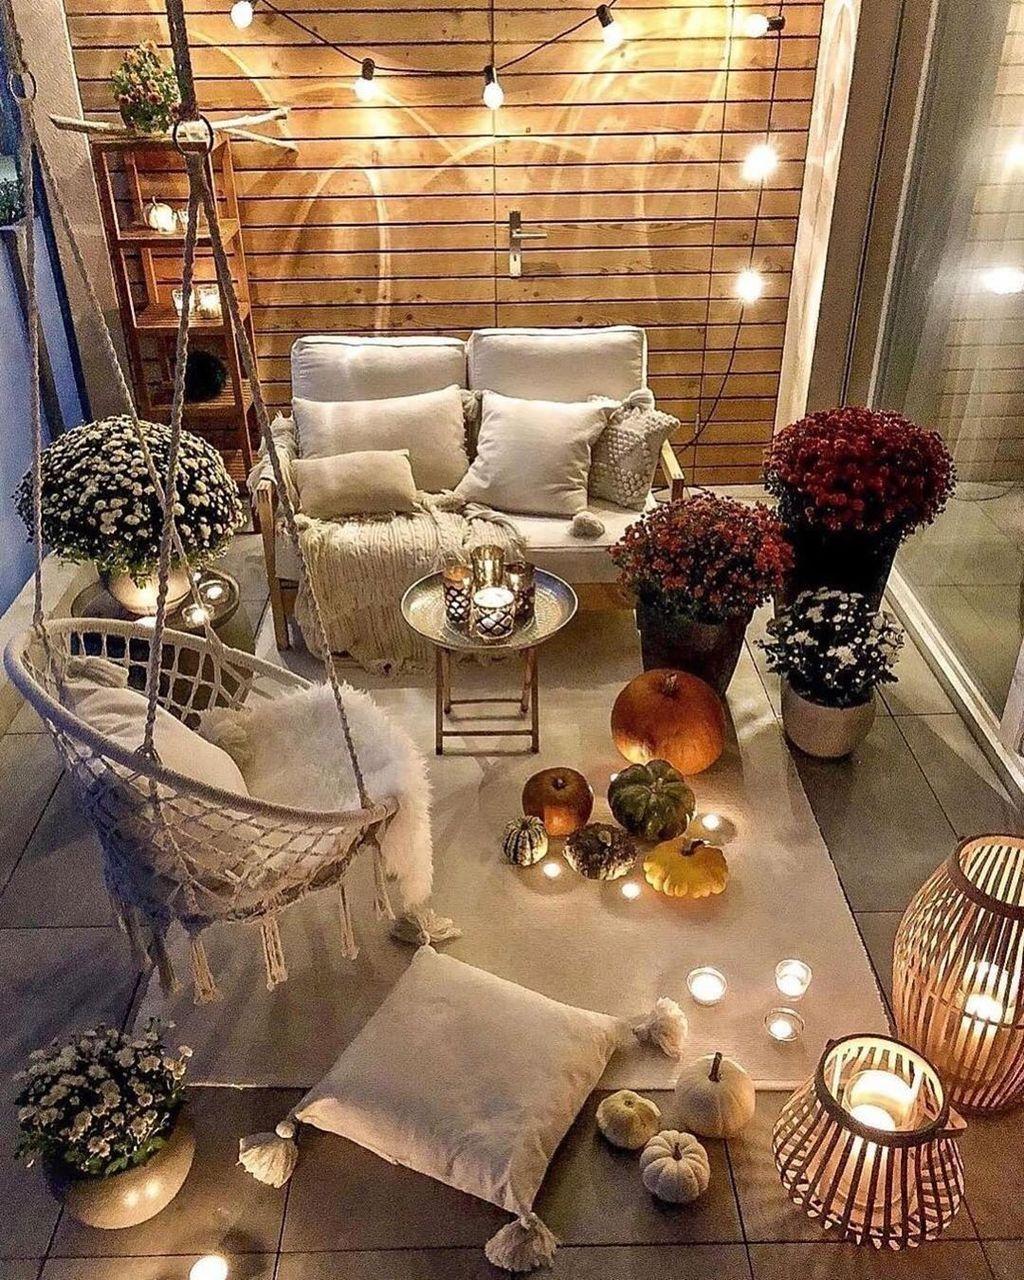 17 Elegant And Cozy Balcony Ideas in 17  Apartment balcony